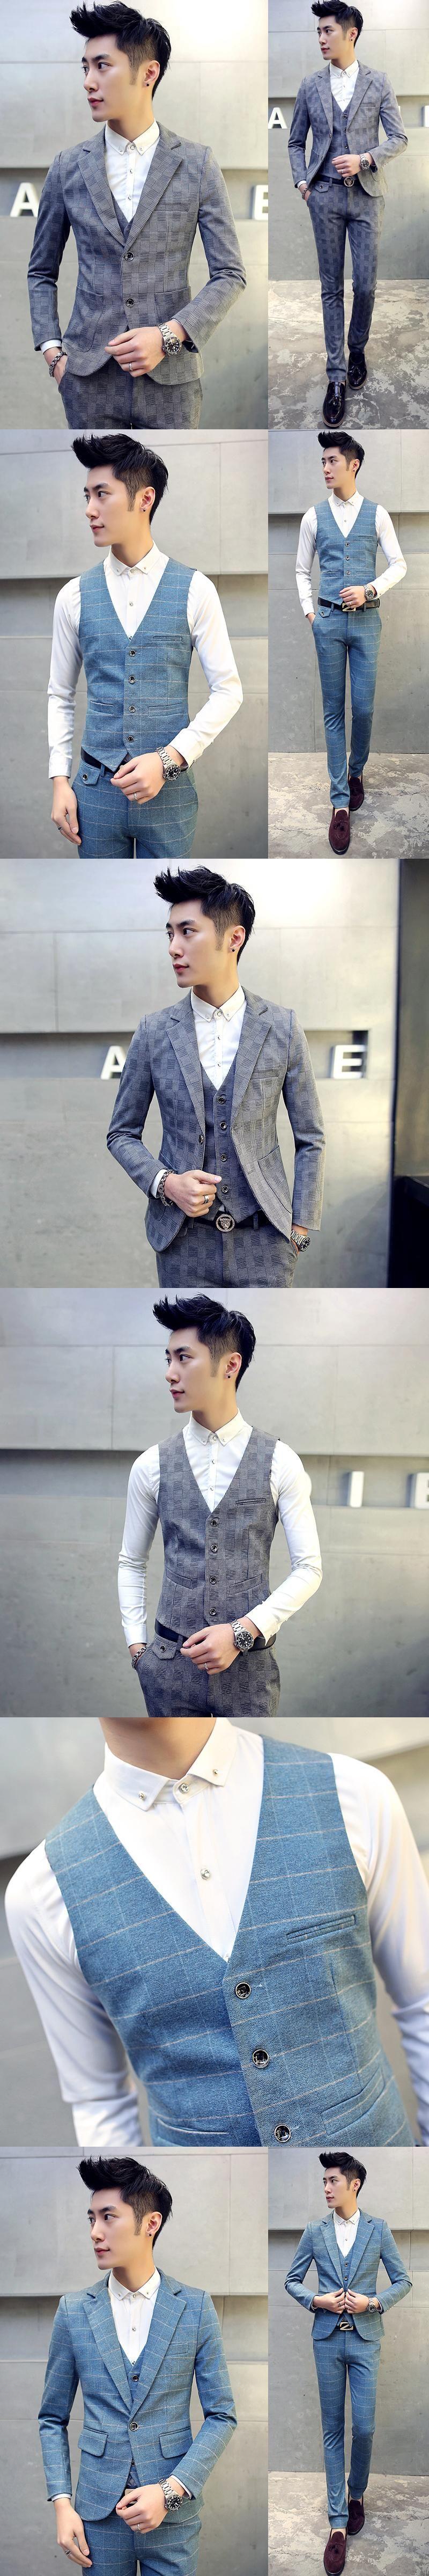 High quality men's large size Slim suits Teen Wedding Dress Formal wear clothes male Business Casual Suits jacket+vest+pants